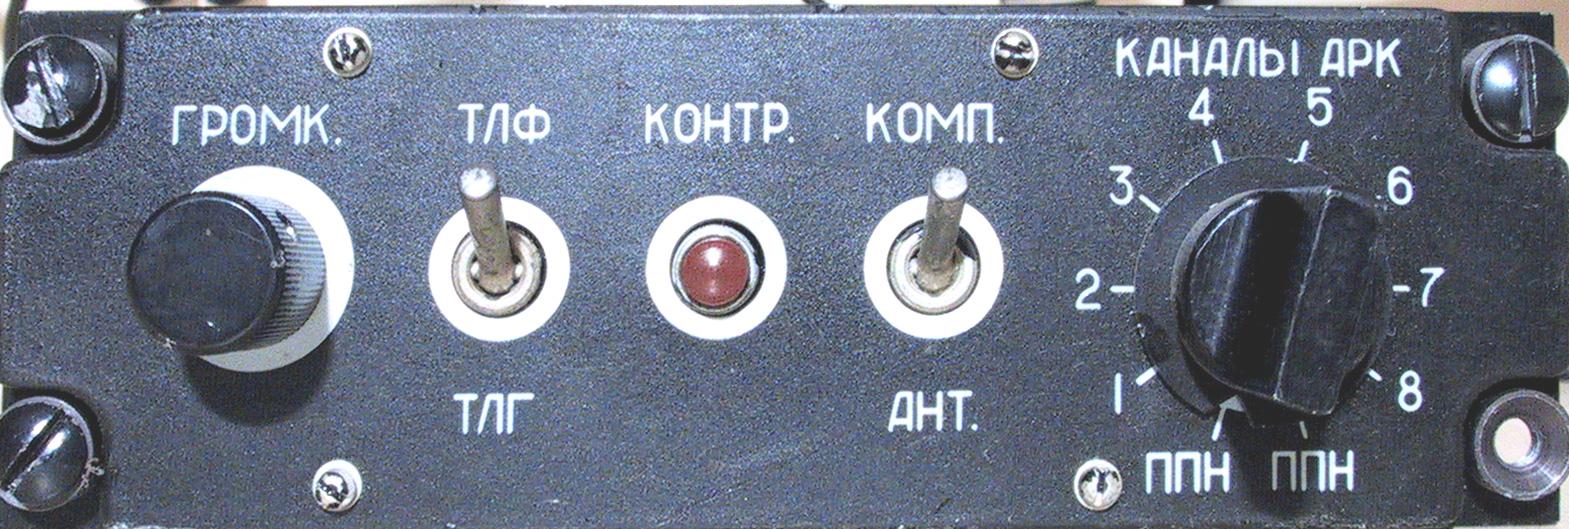 http://s5.uploads.ru/XovBx.jpg